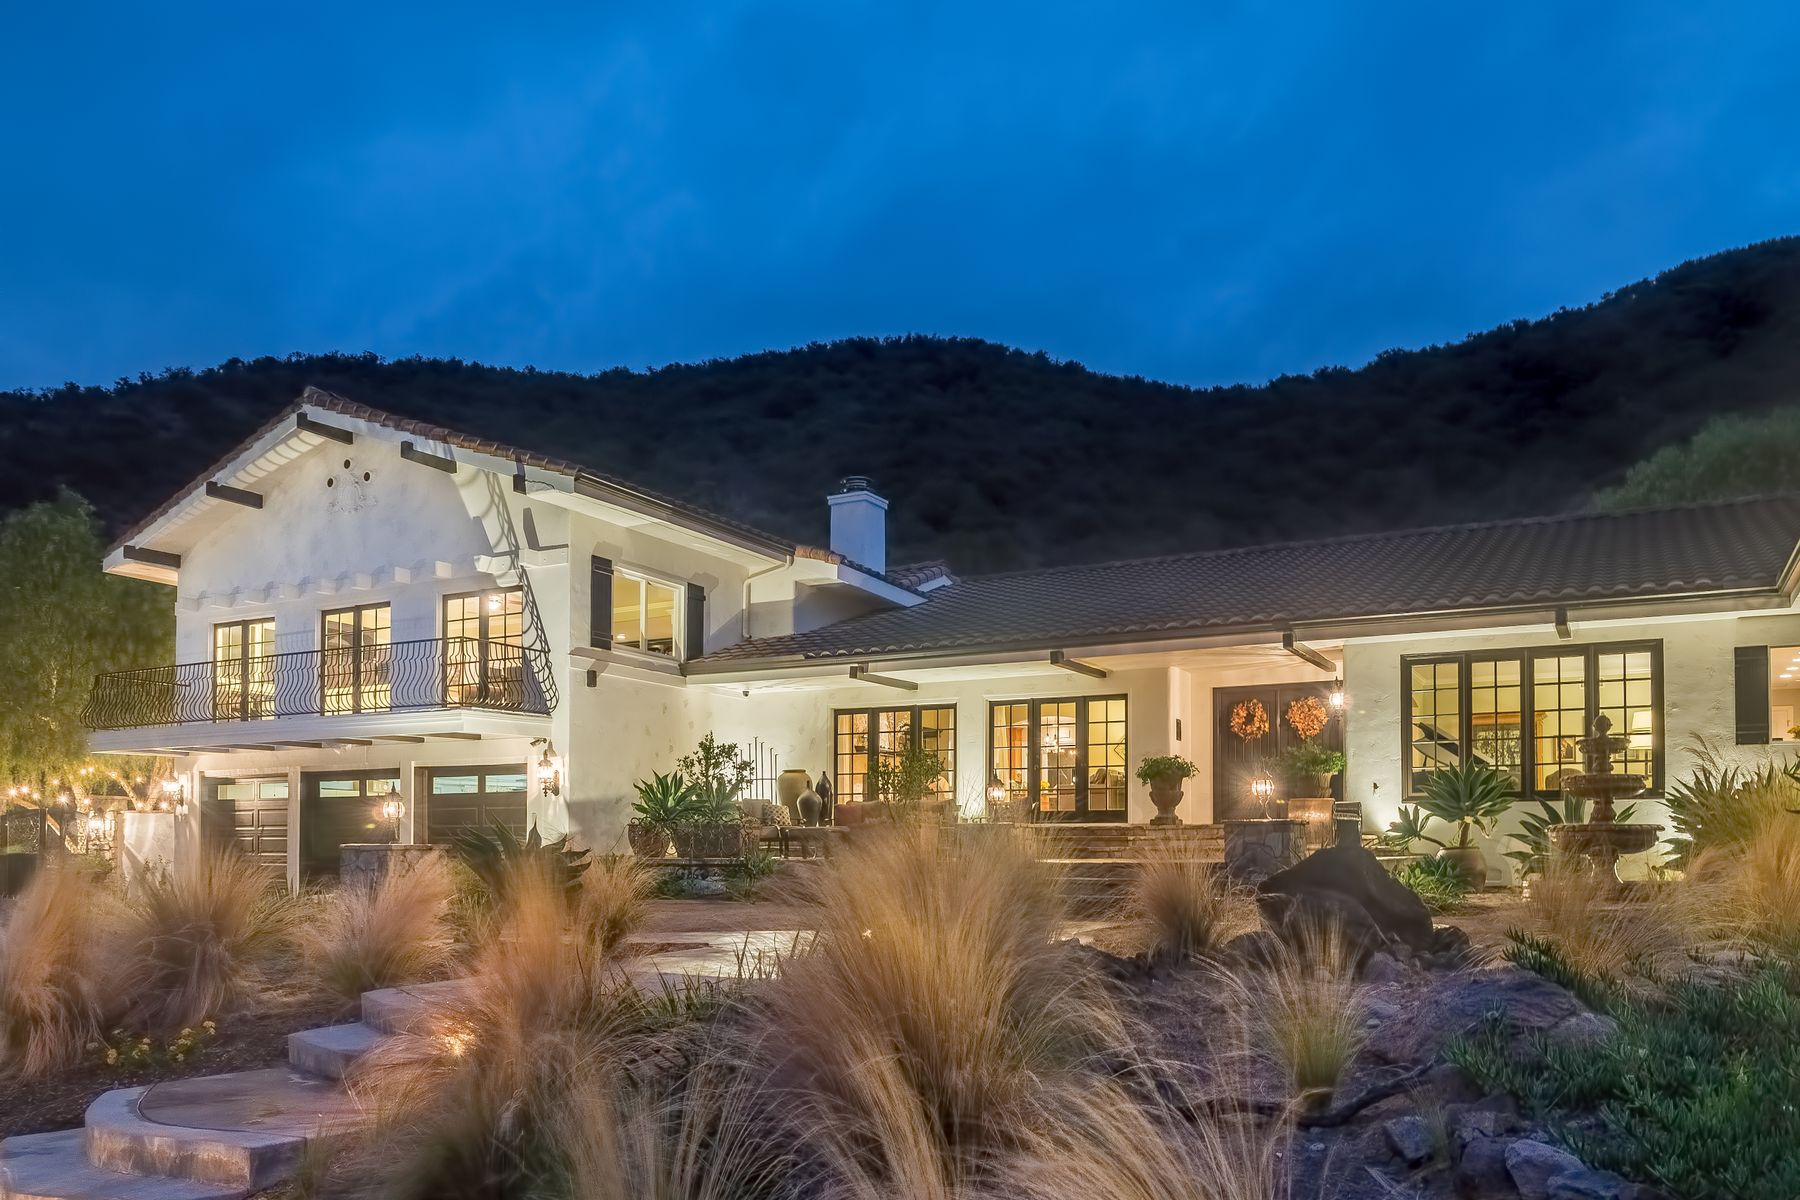 Vineyard Real Estate for Sale at Puerta Del Cielo Vineyard Estate 36 Pinecrest Road Thousand Oaks, California 91361 United States